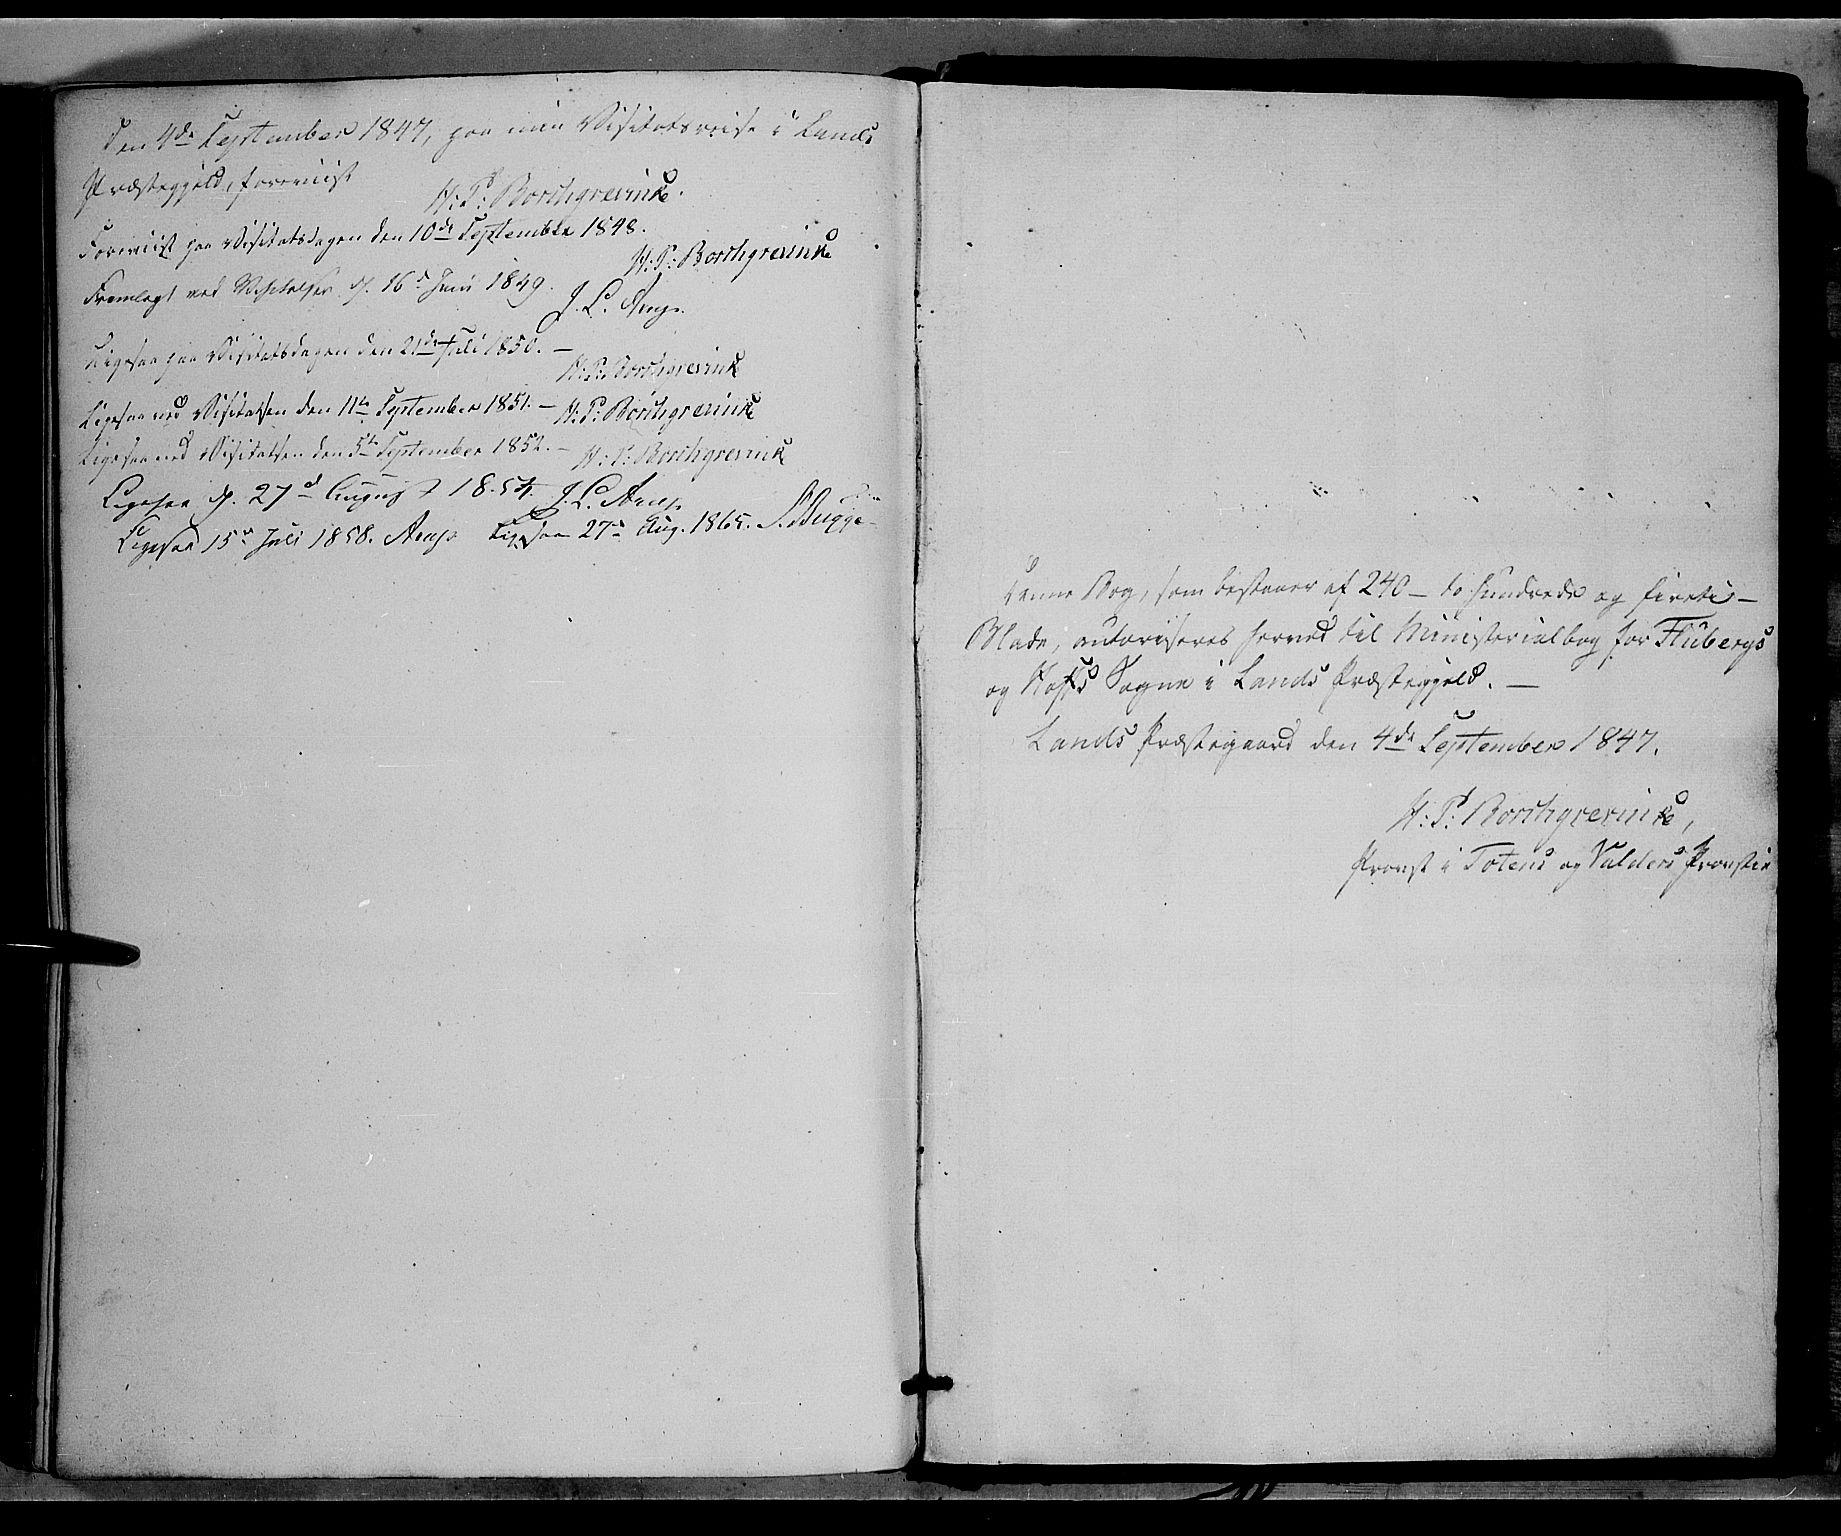 SAH, Land prestekontor, Ministerialbok nr. 9, 1847-1859